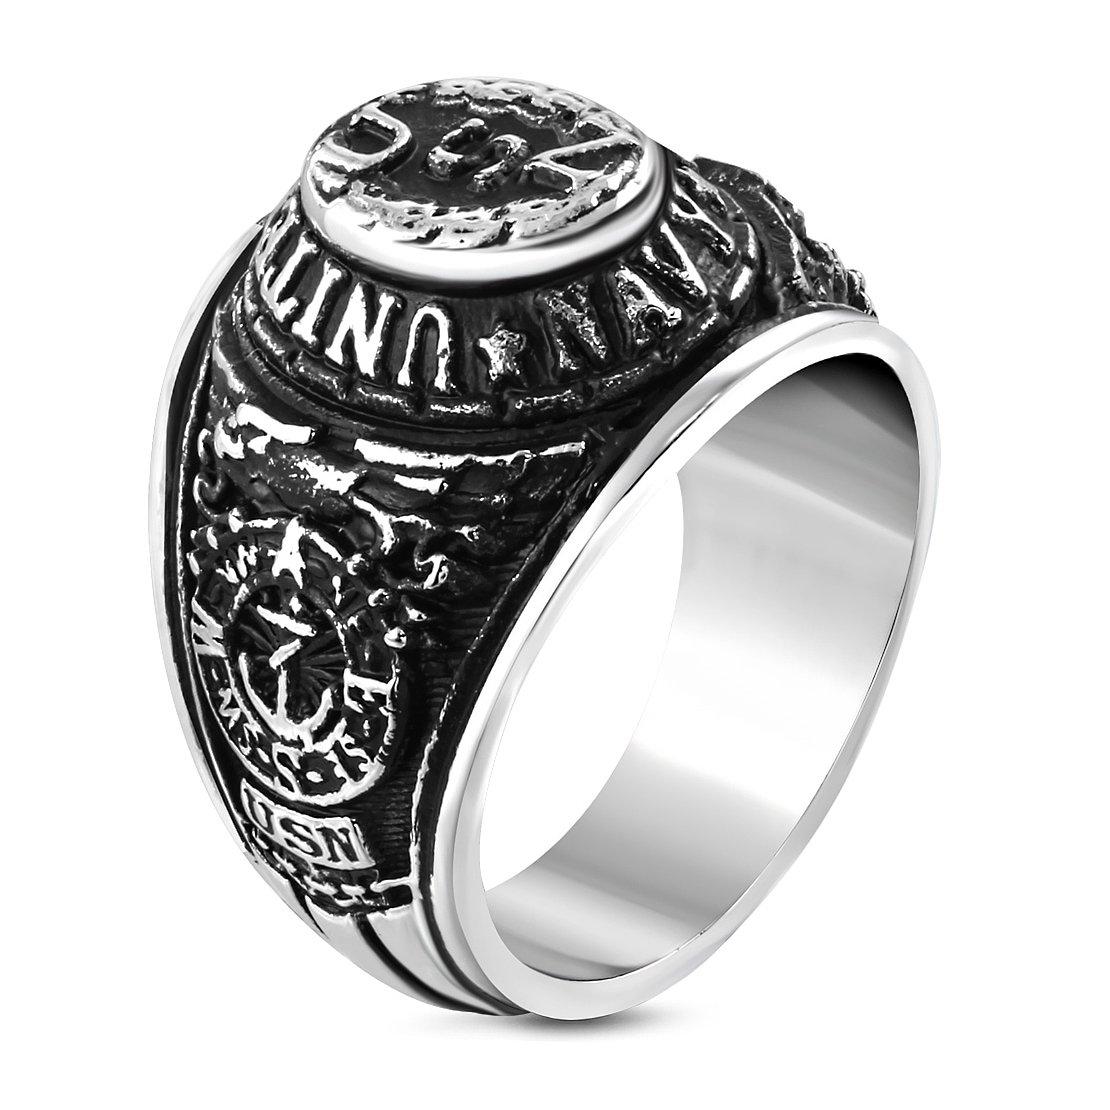 Stainless Steel 2 Color US Navy Biker Ring